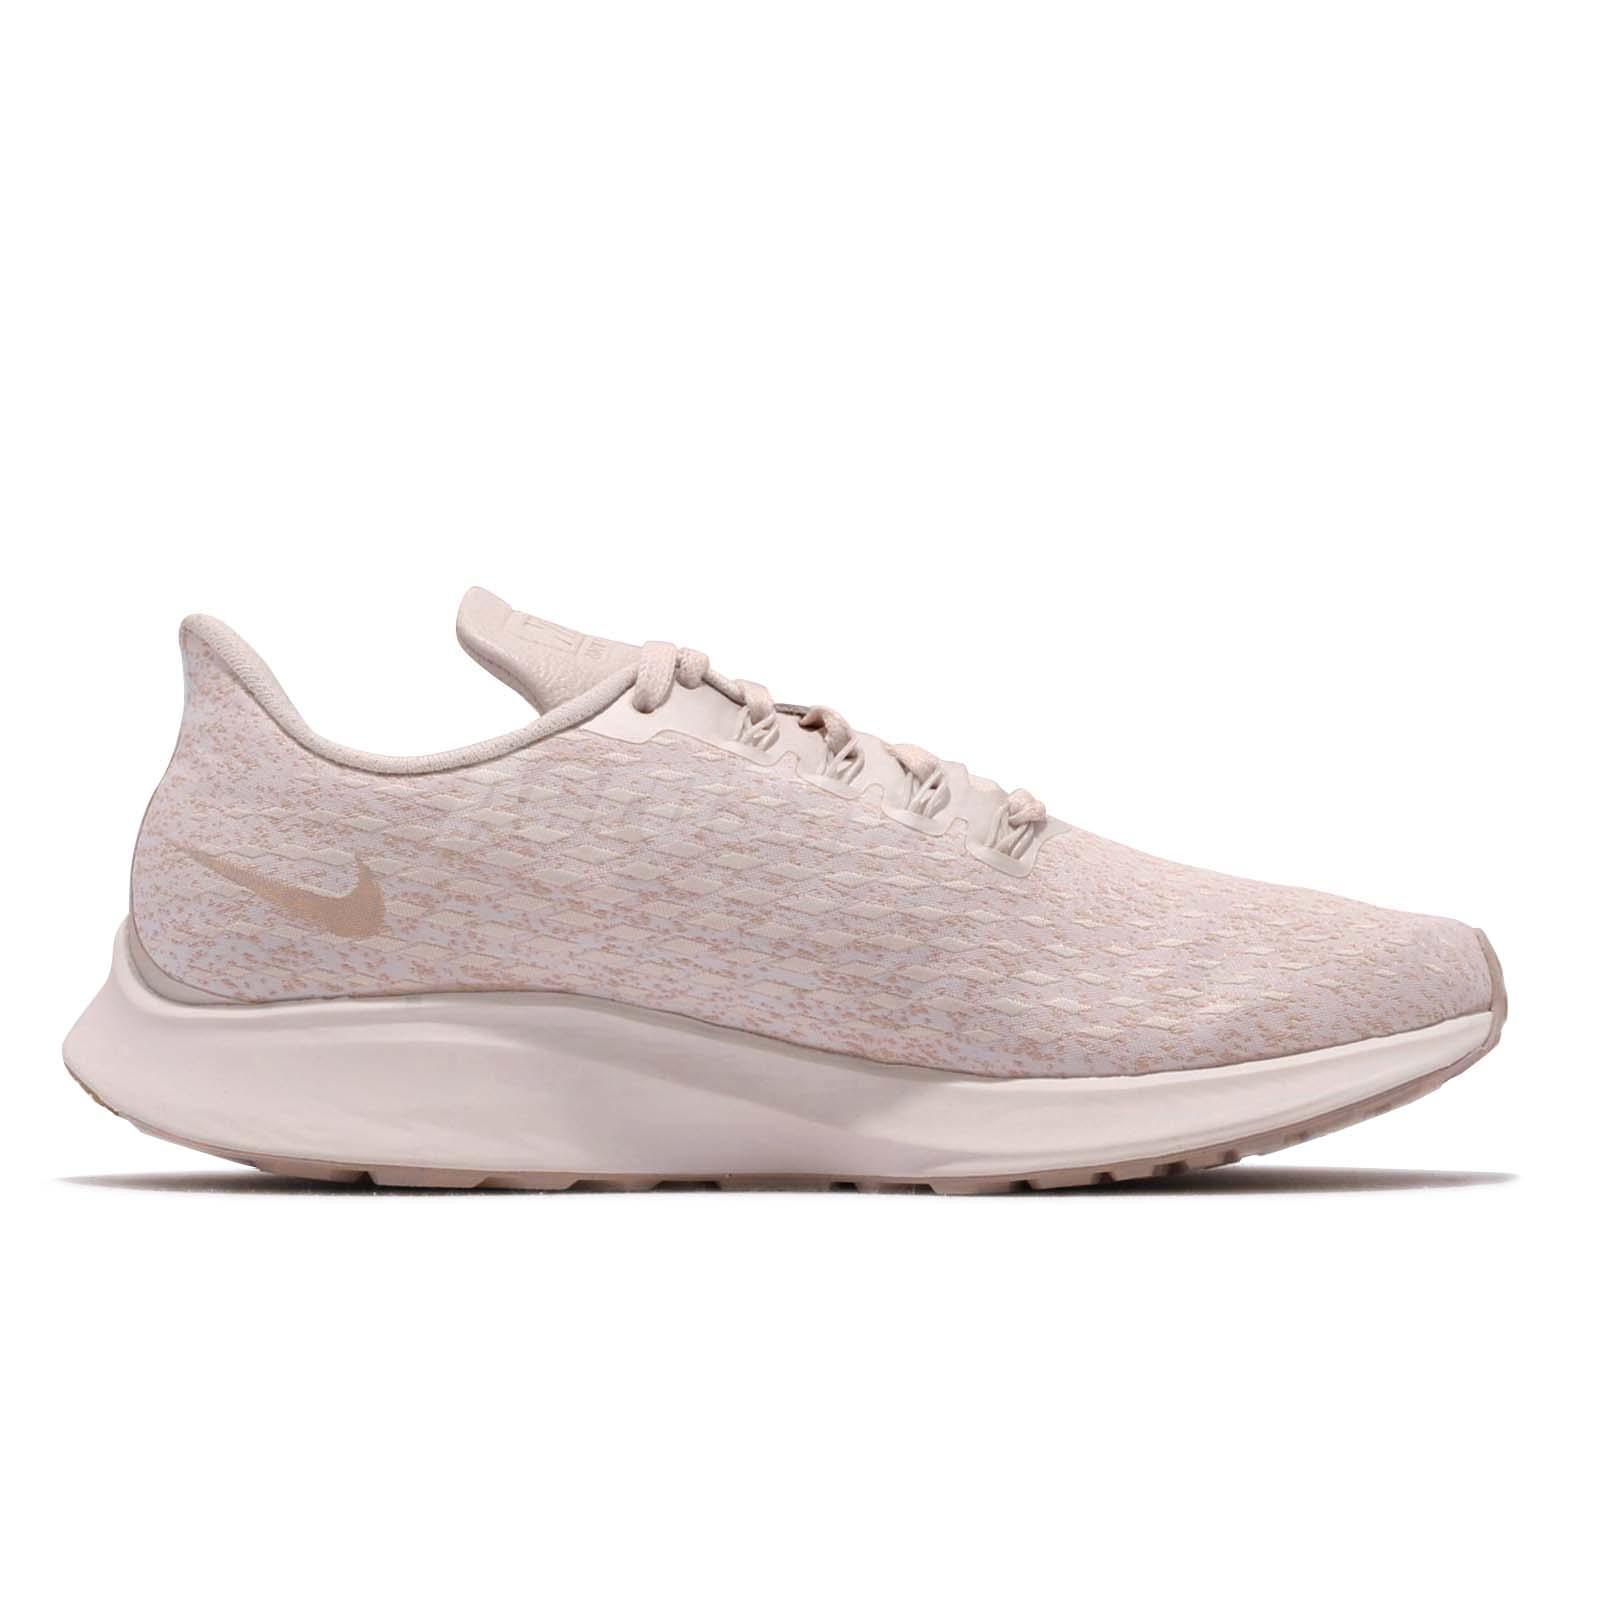 2f1eea5cd2e75 Nike Wmns Air Zoom Pegasus 35 PRM Particle Beige Women Running Shoes ...